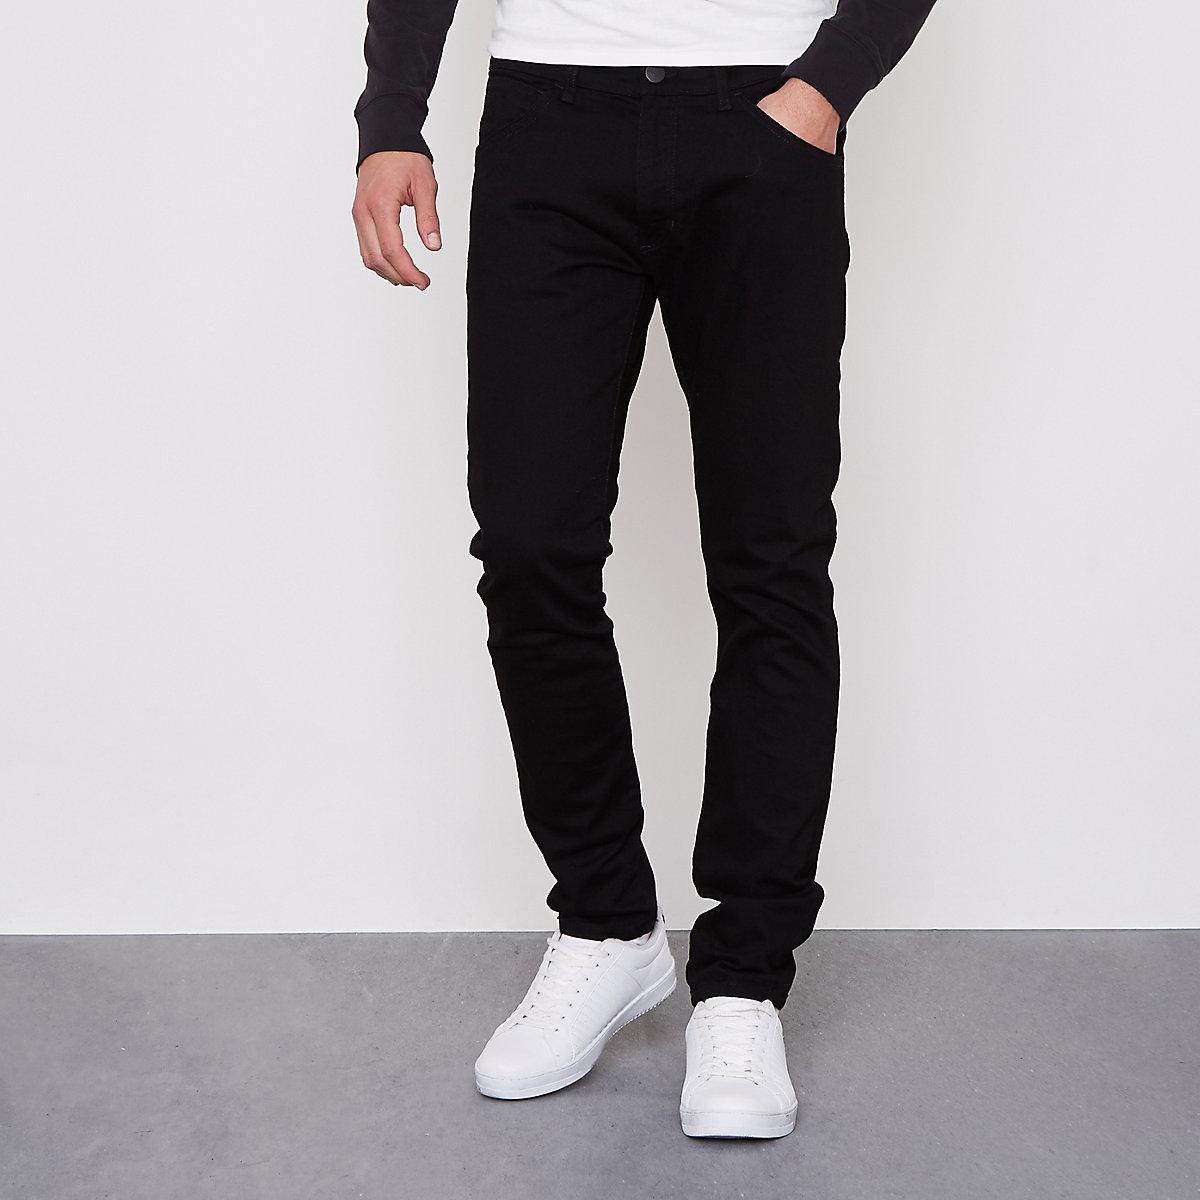 Wrangler – Bryson – Schwarze Skinny Fit Jeans - Skinny Jeans - Jeans ... 3f28e9b2bc